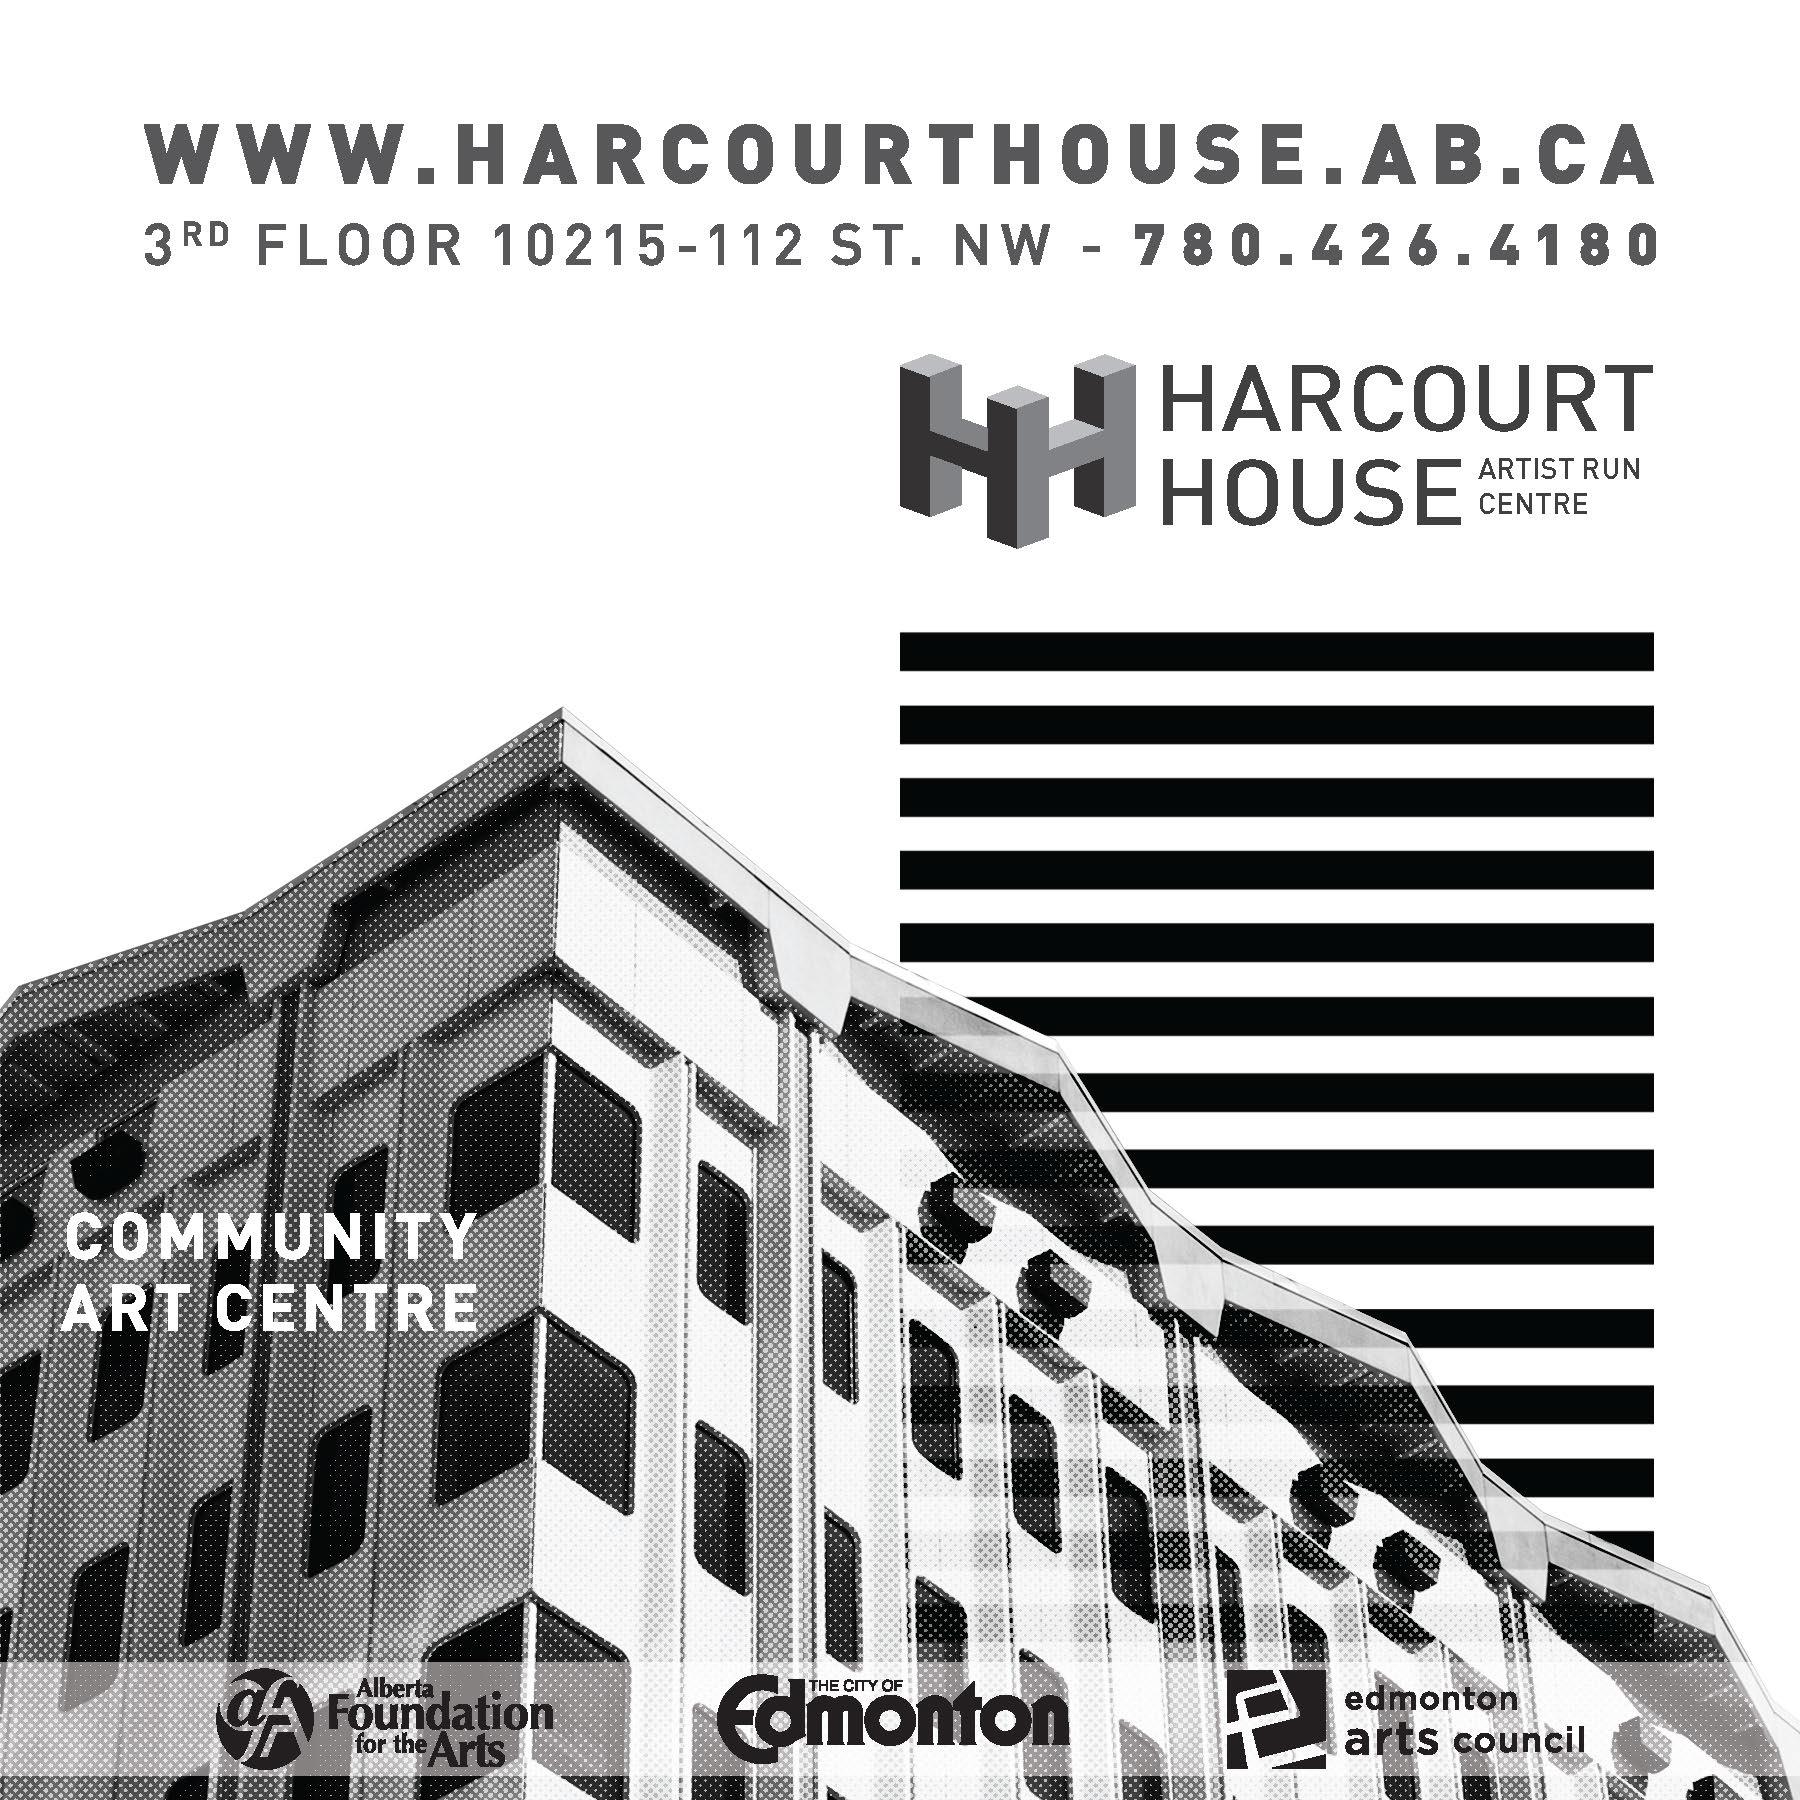 Harcourt_Aug 7_5x5.jpg